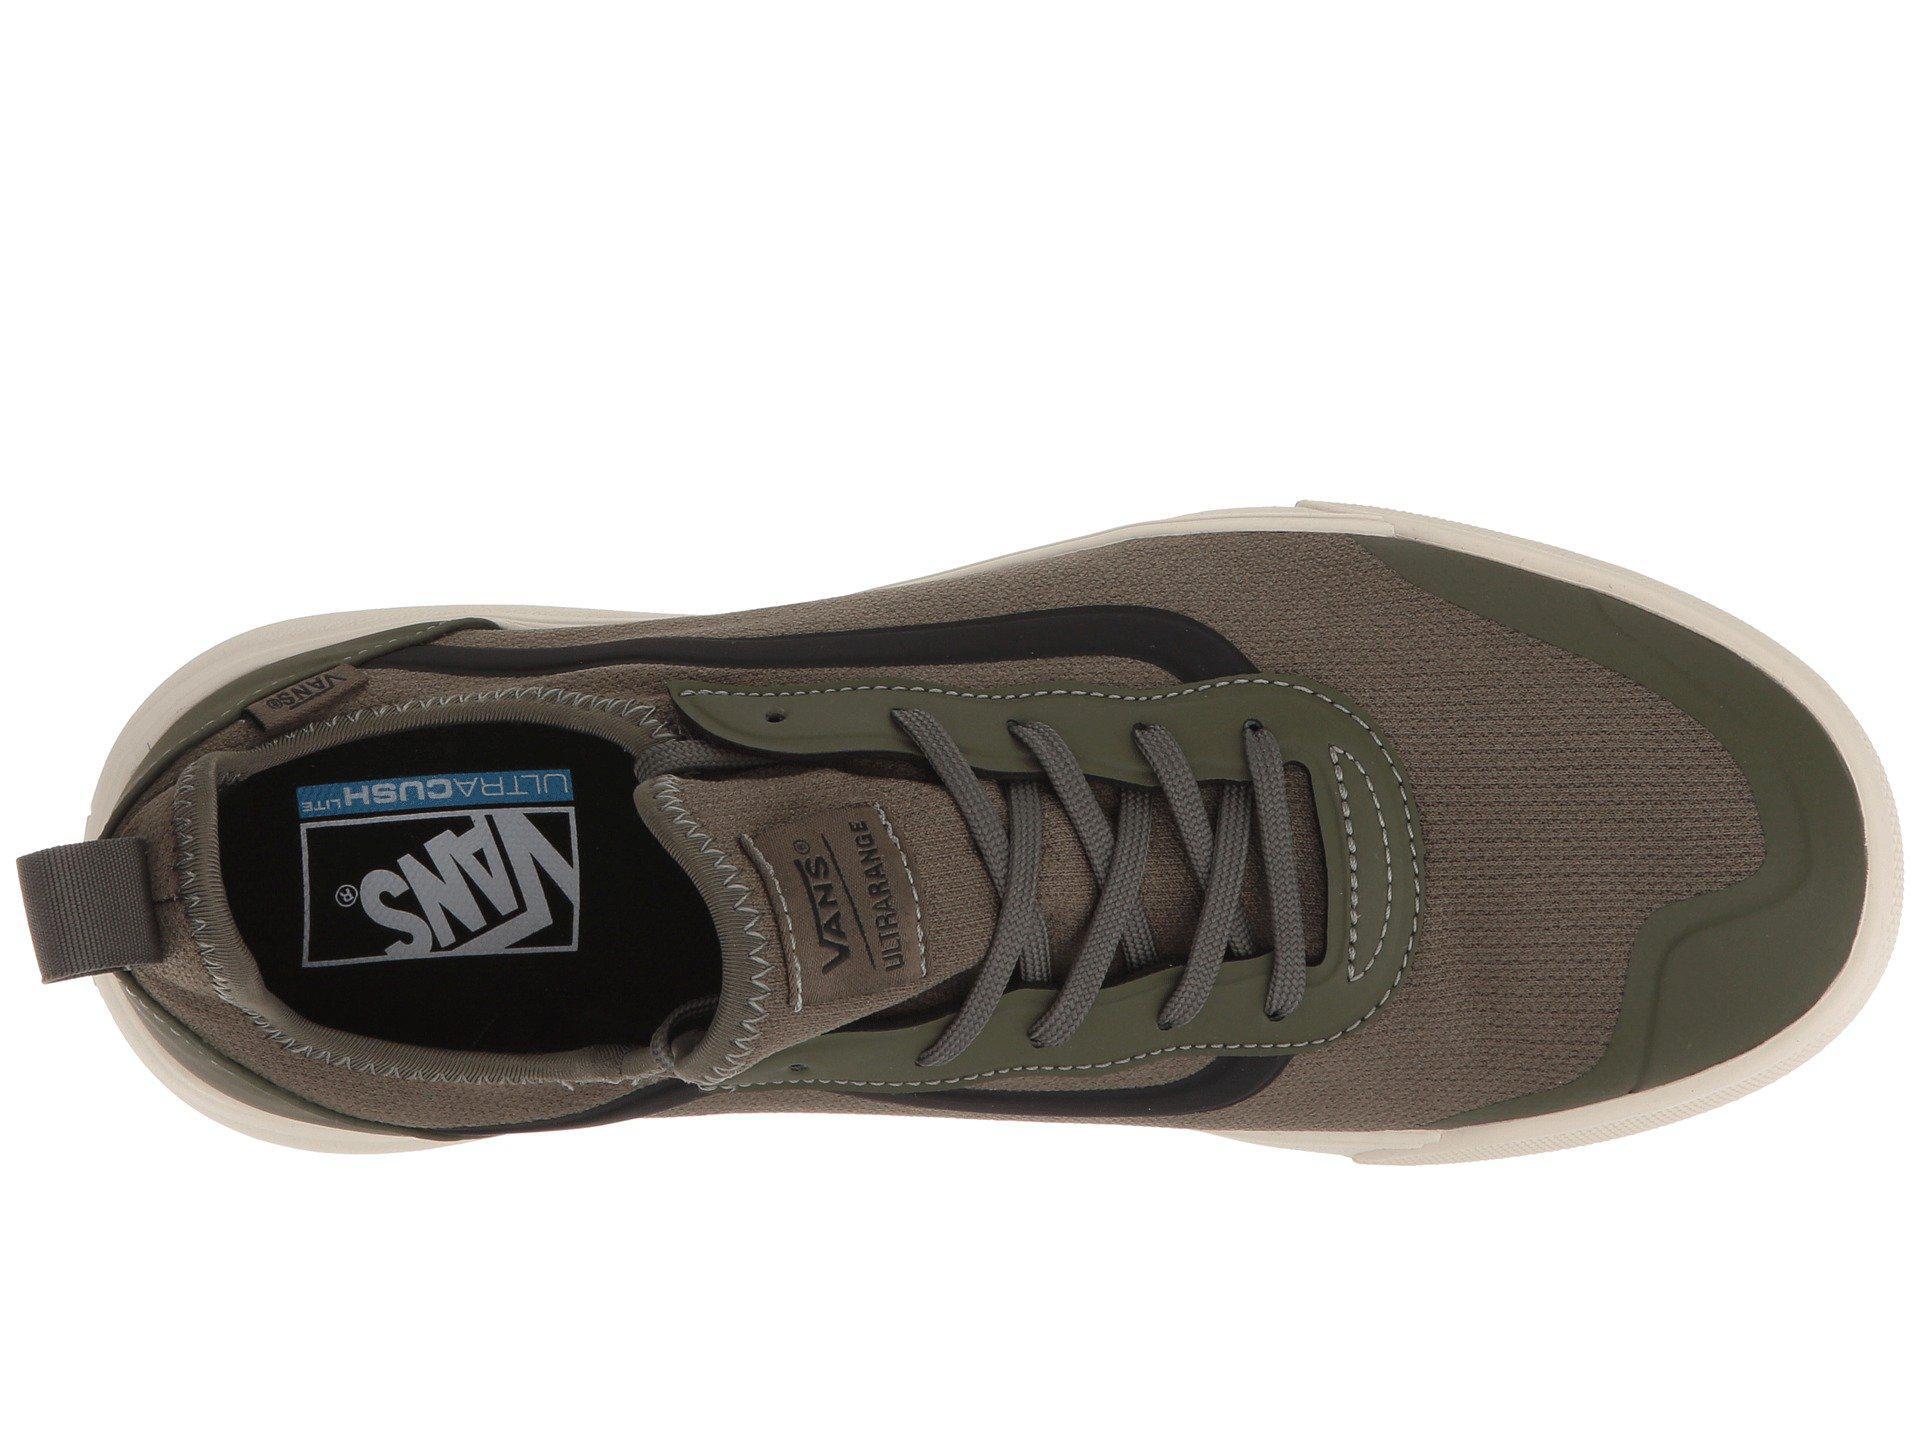 ae91bcbd9ba Lyst - Vans Ultrarange Ac (catawba Grape black) Skate Shoes for Men